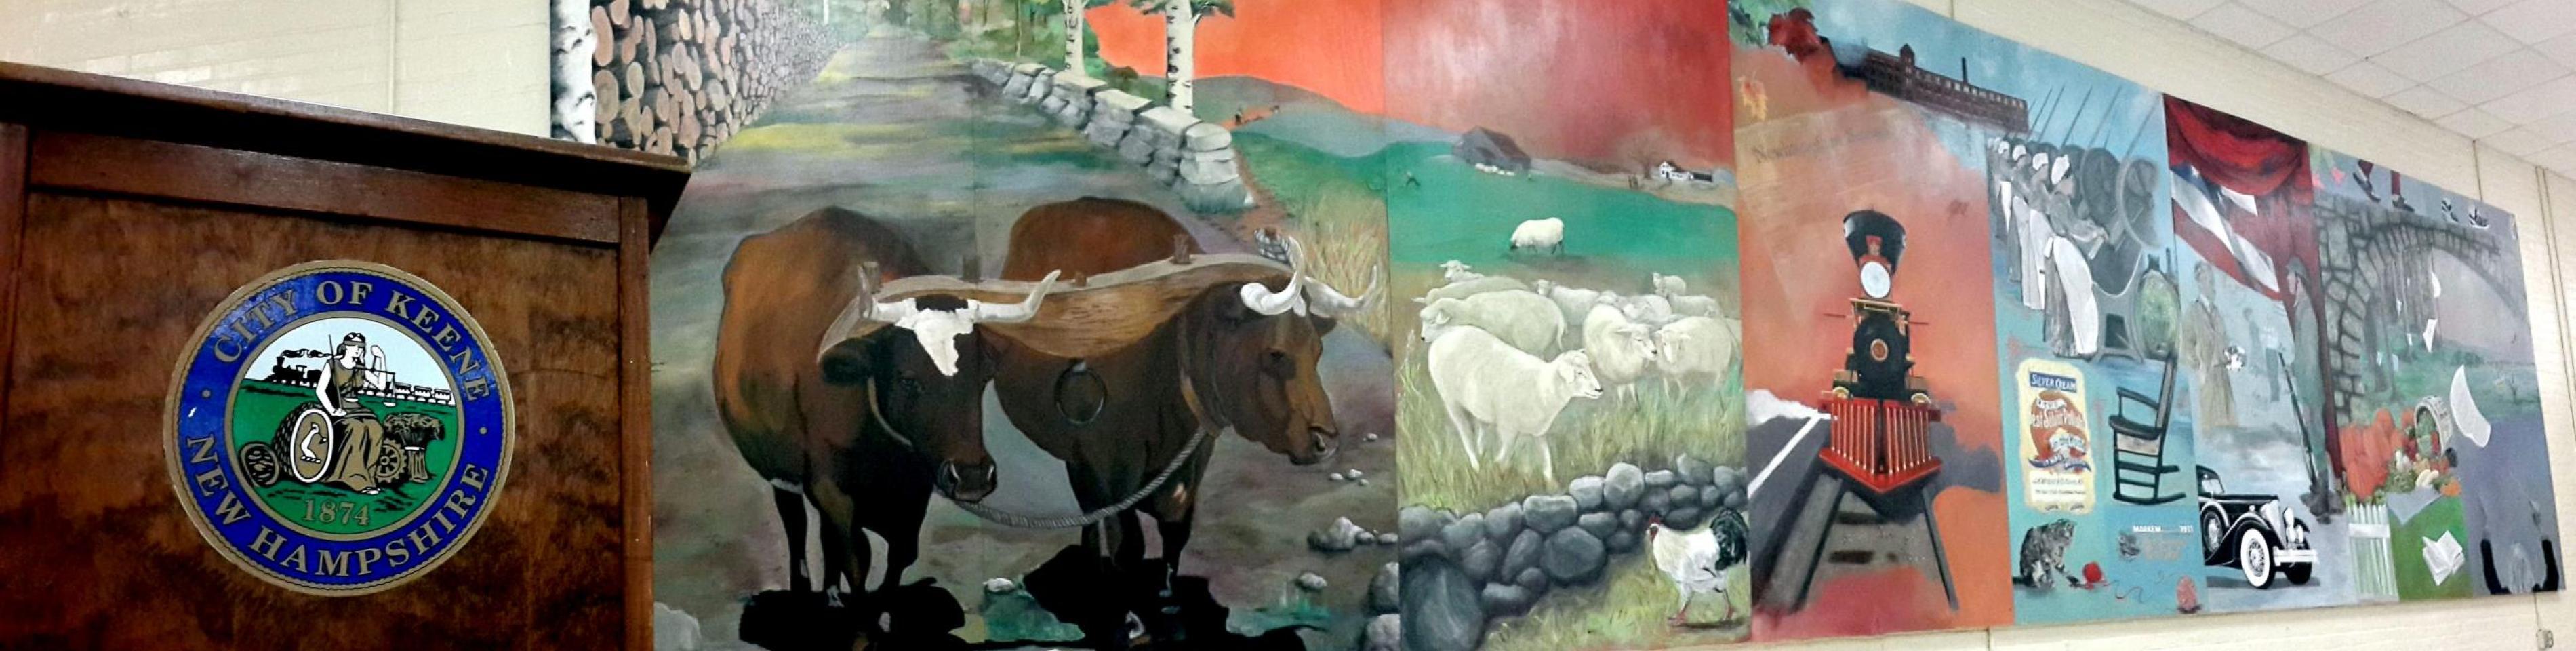 Keene Mural